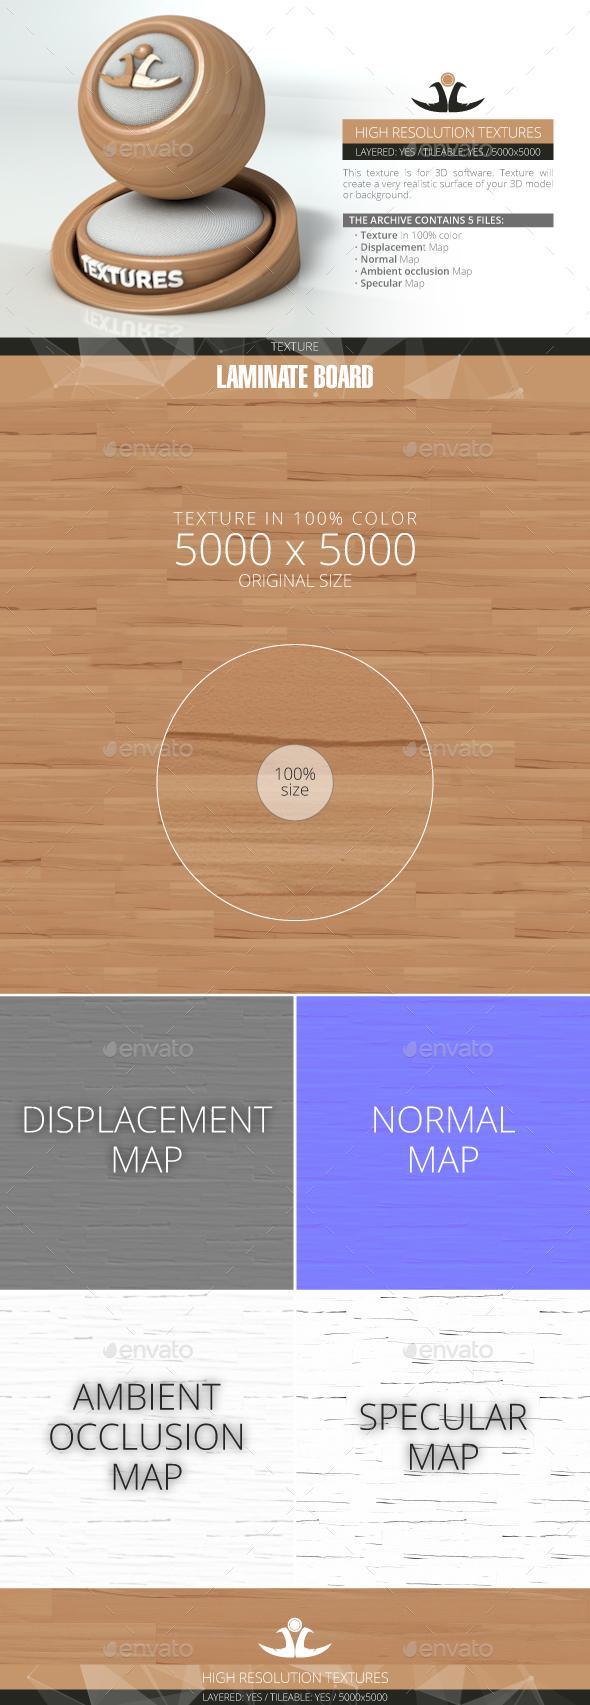 Laminate Board 21 - 3DOcean Item for Sale